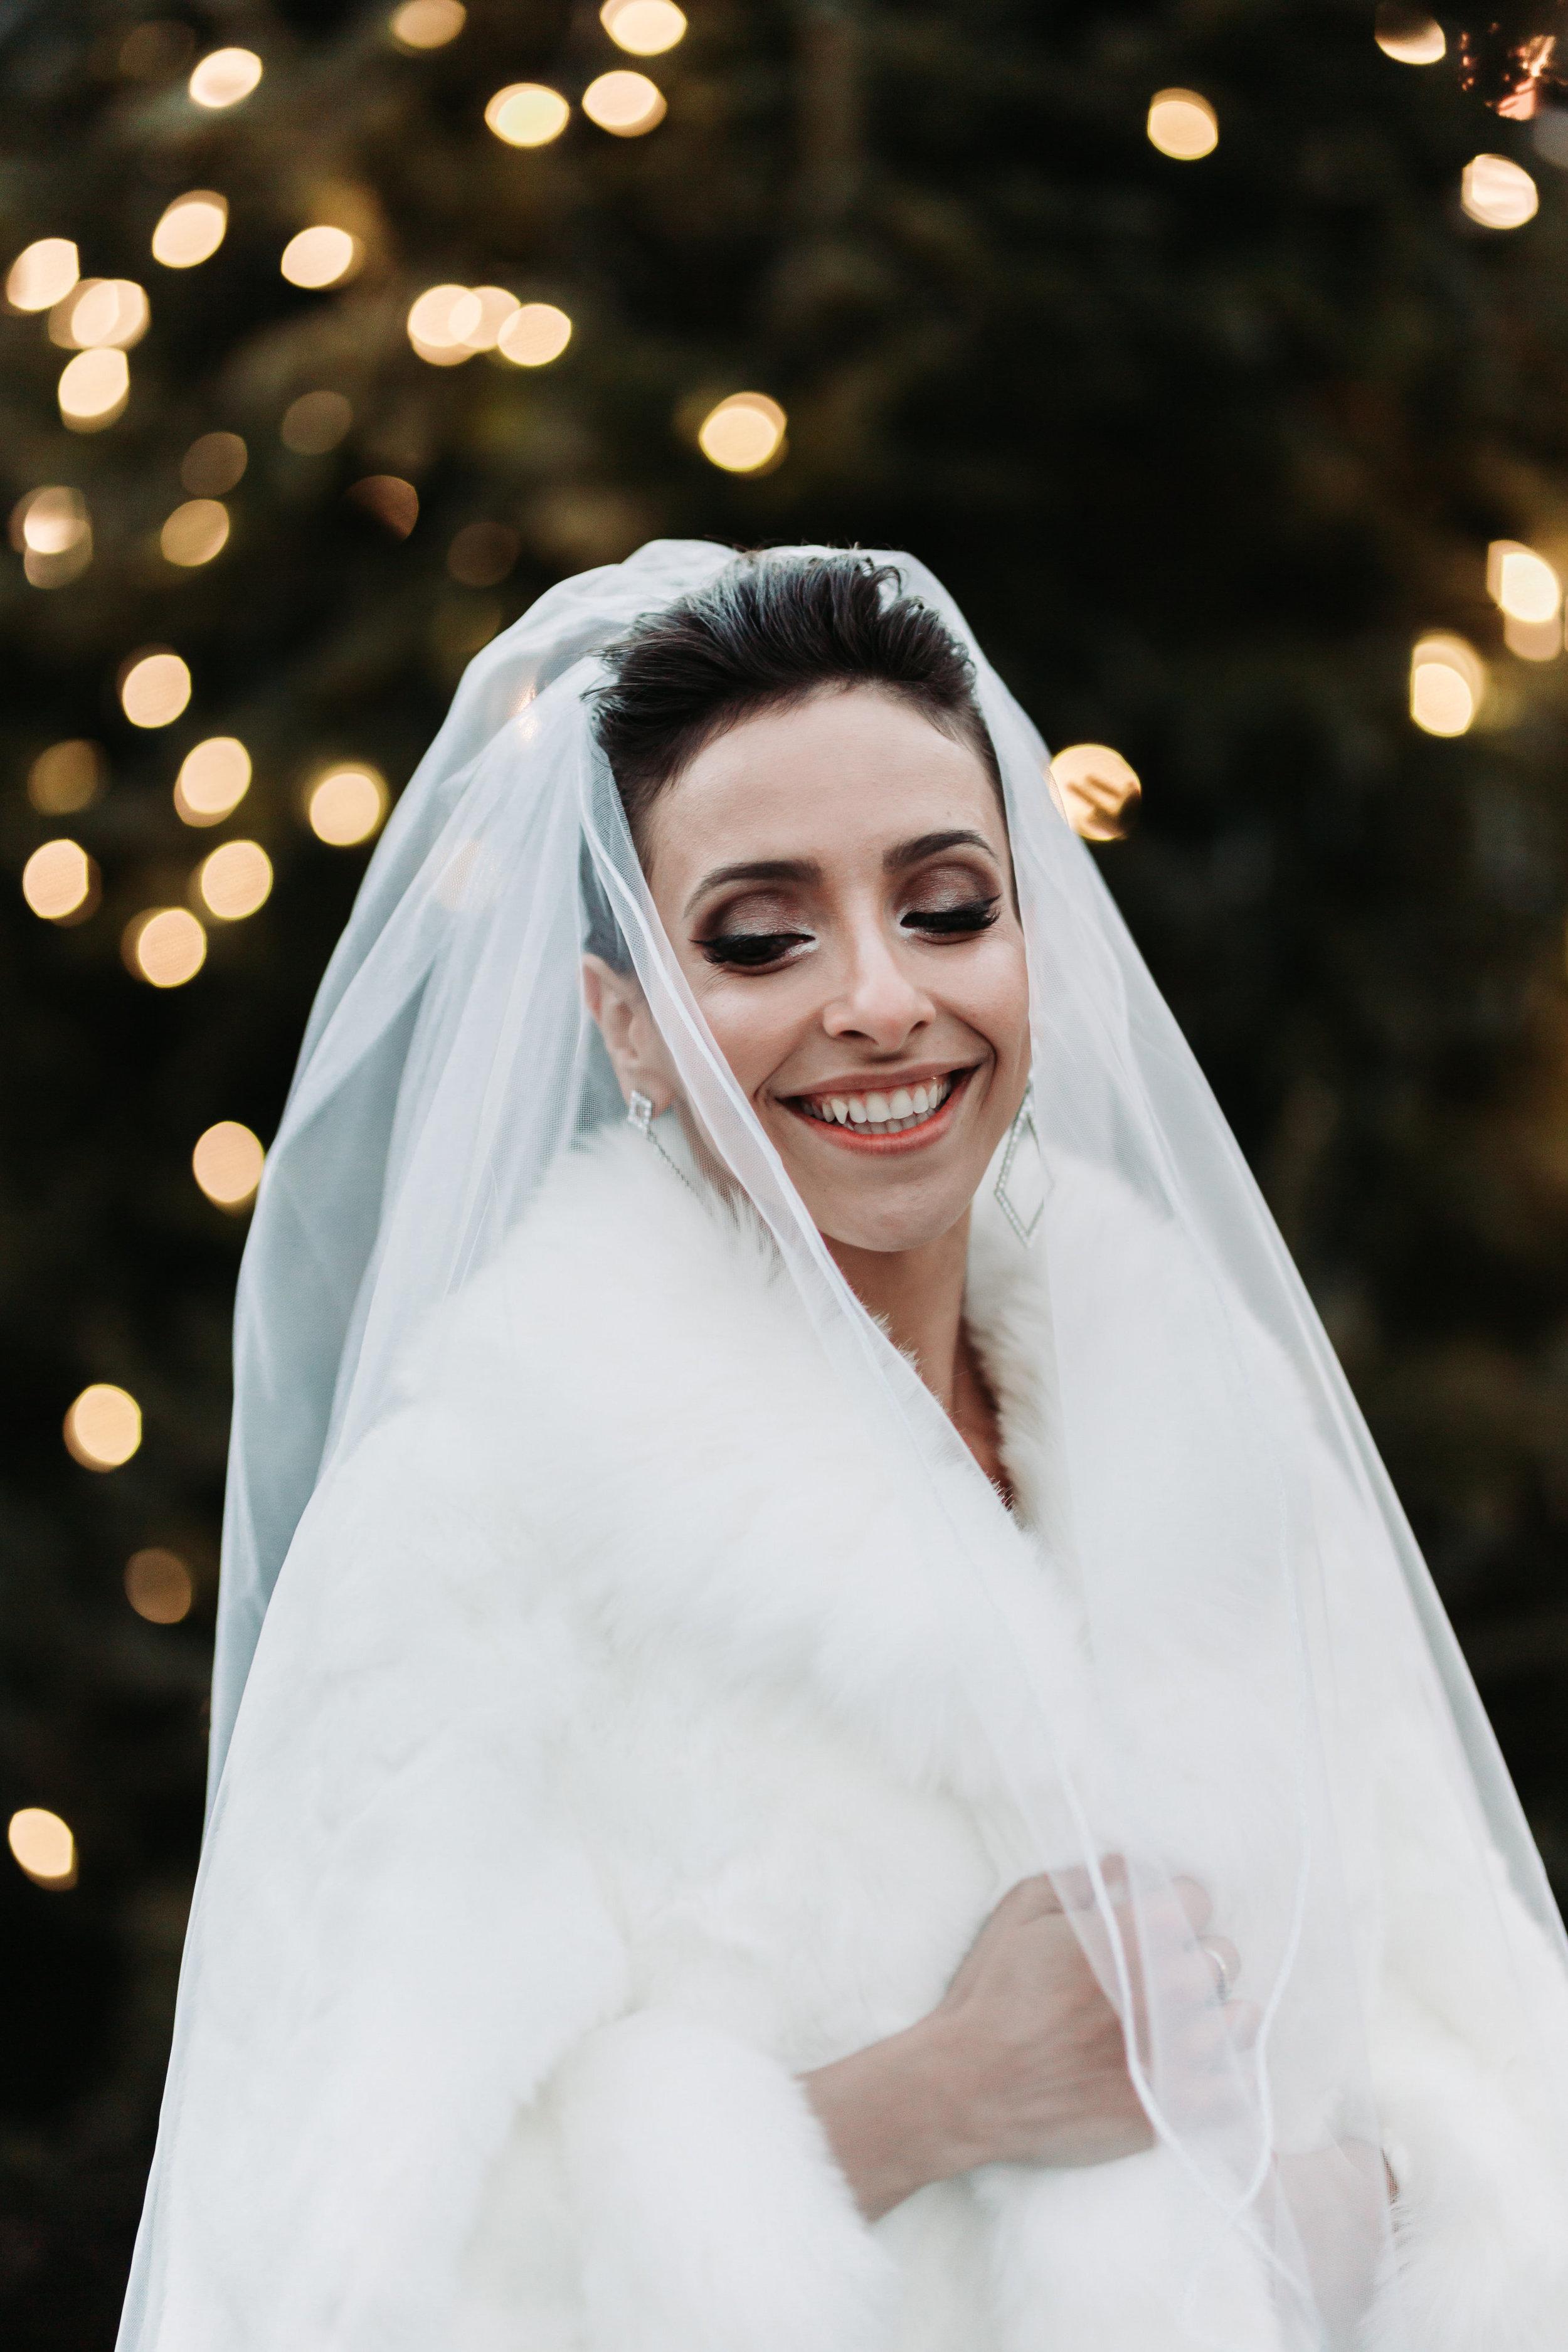 Carina Loss e Thiago Casamento Gabriel-Carina Loss e Thiago Casamento -0273.jpg